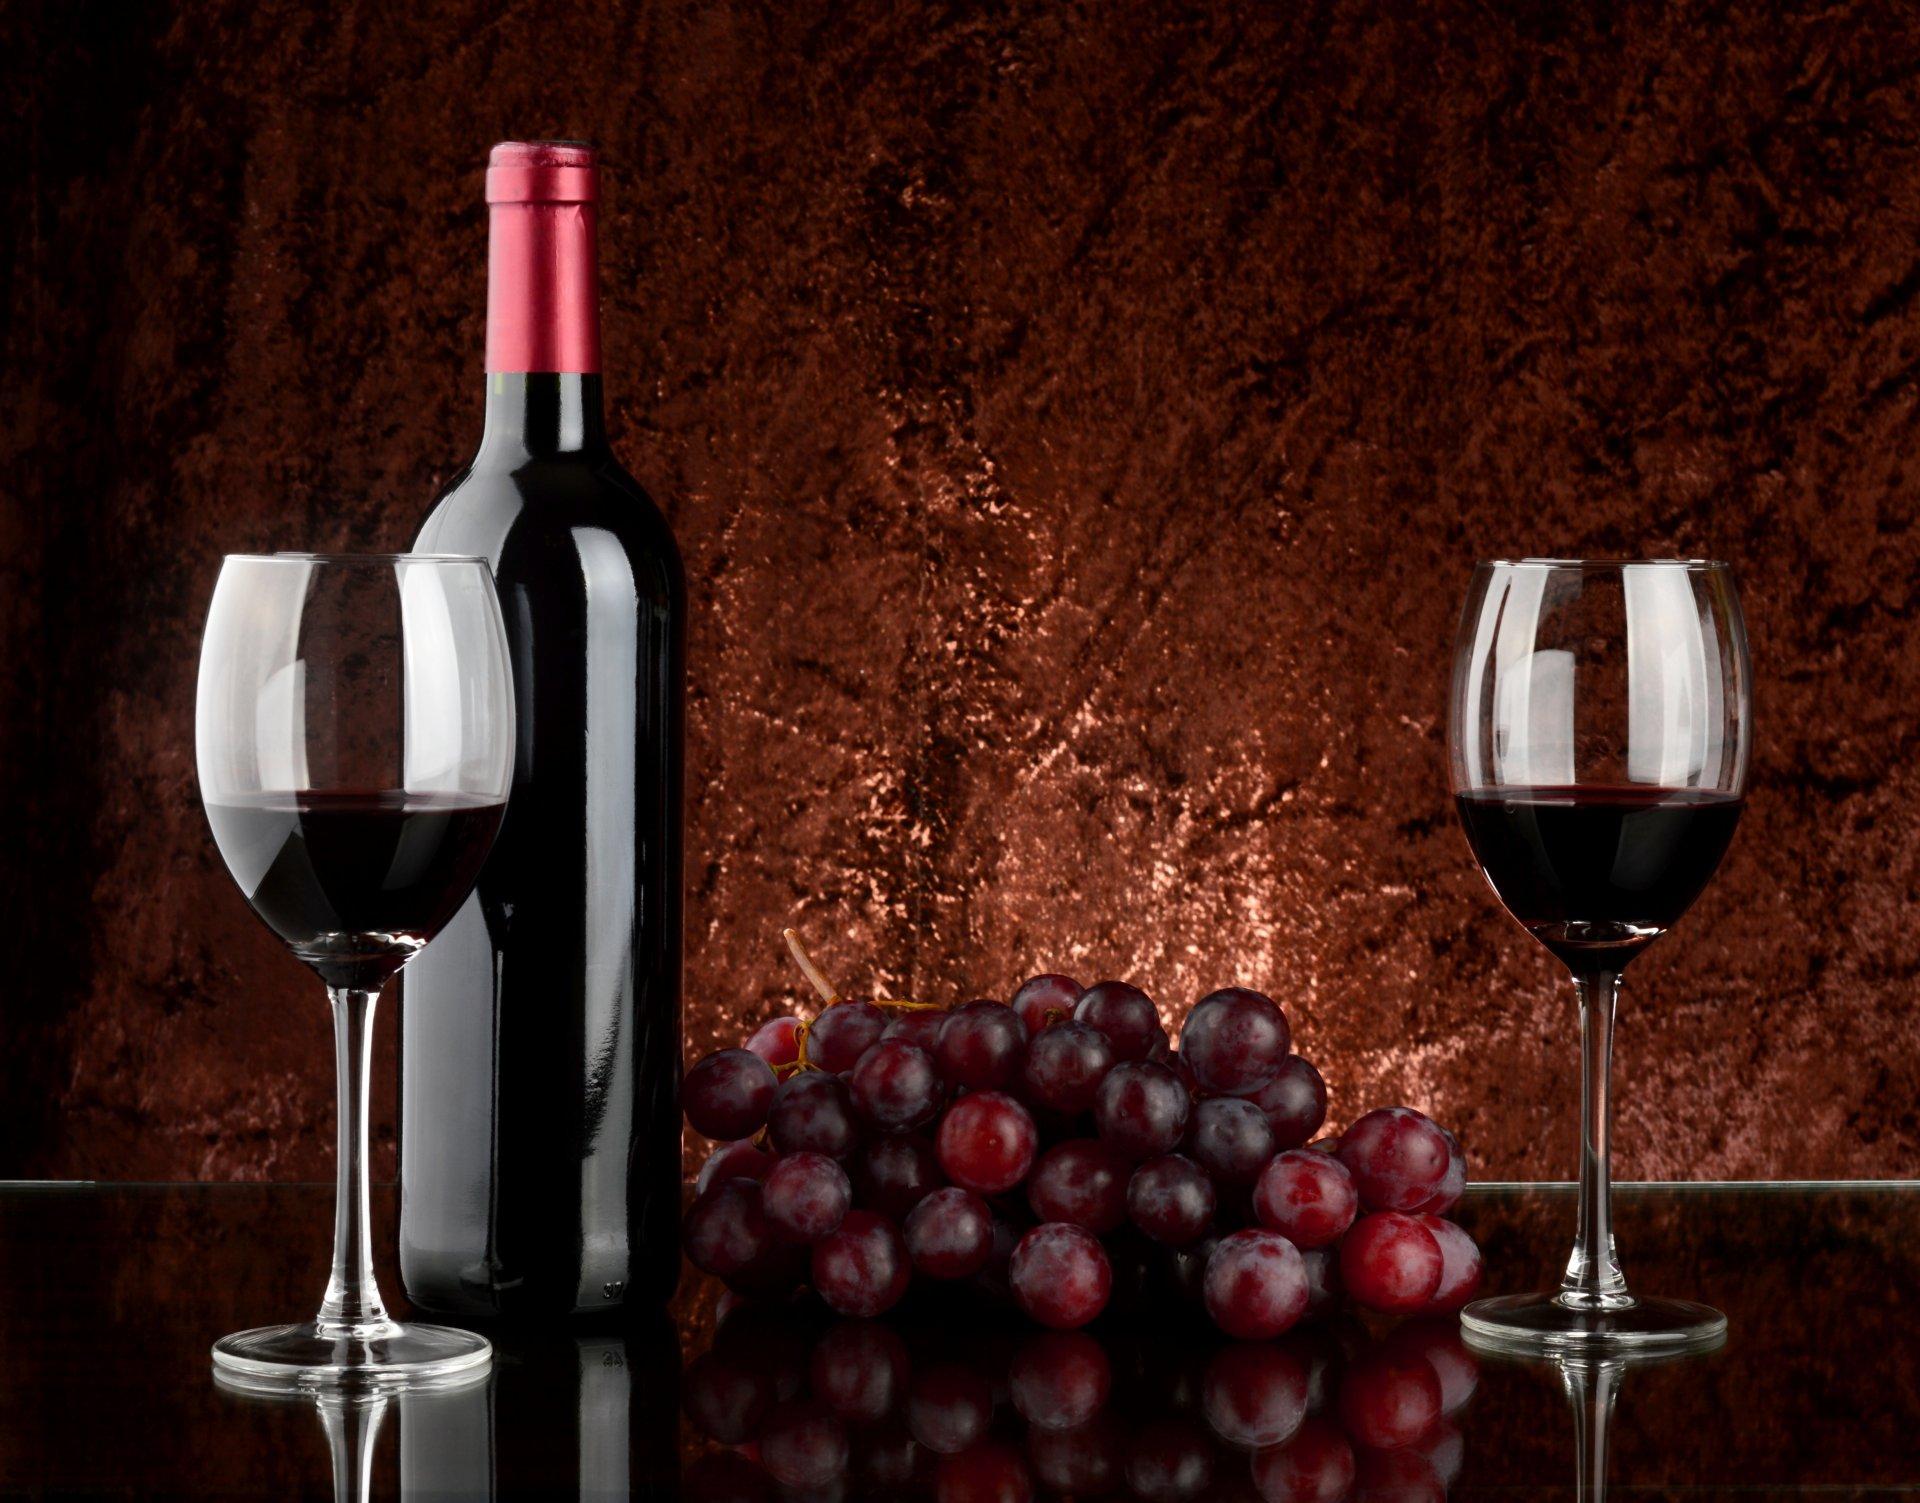 Открытка вино и бокалы, шары